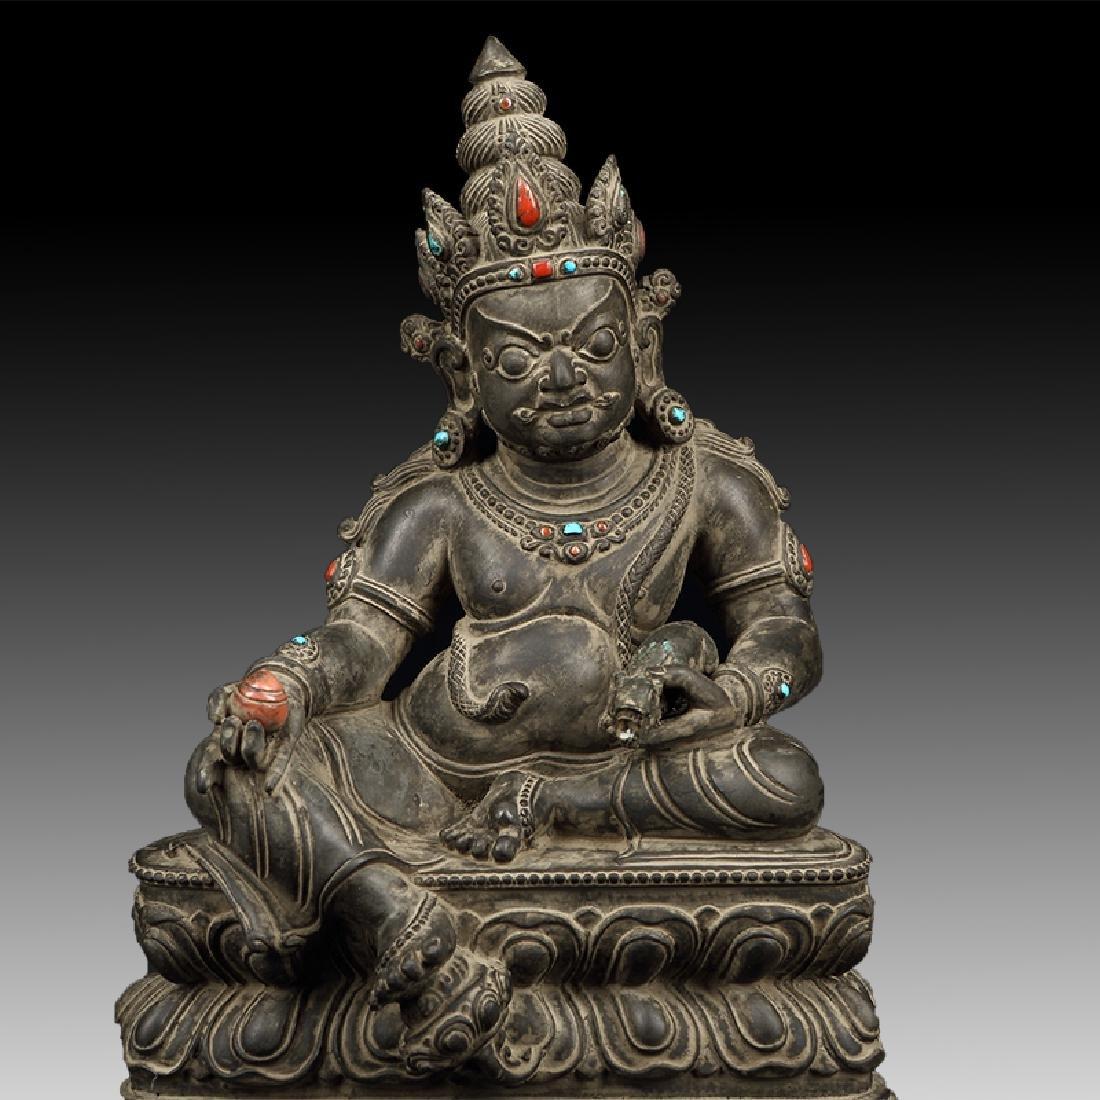 Chinese Antique Stone Buddha - 5